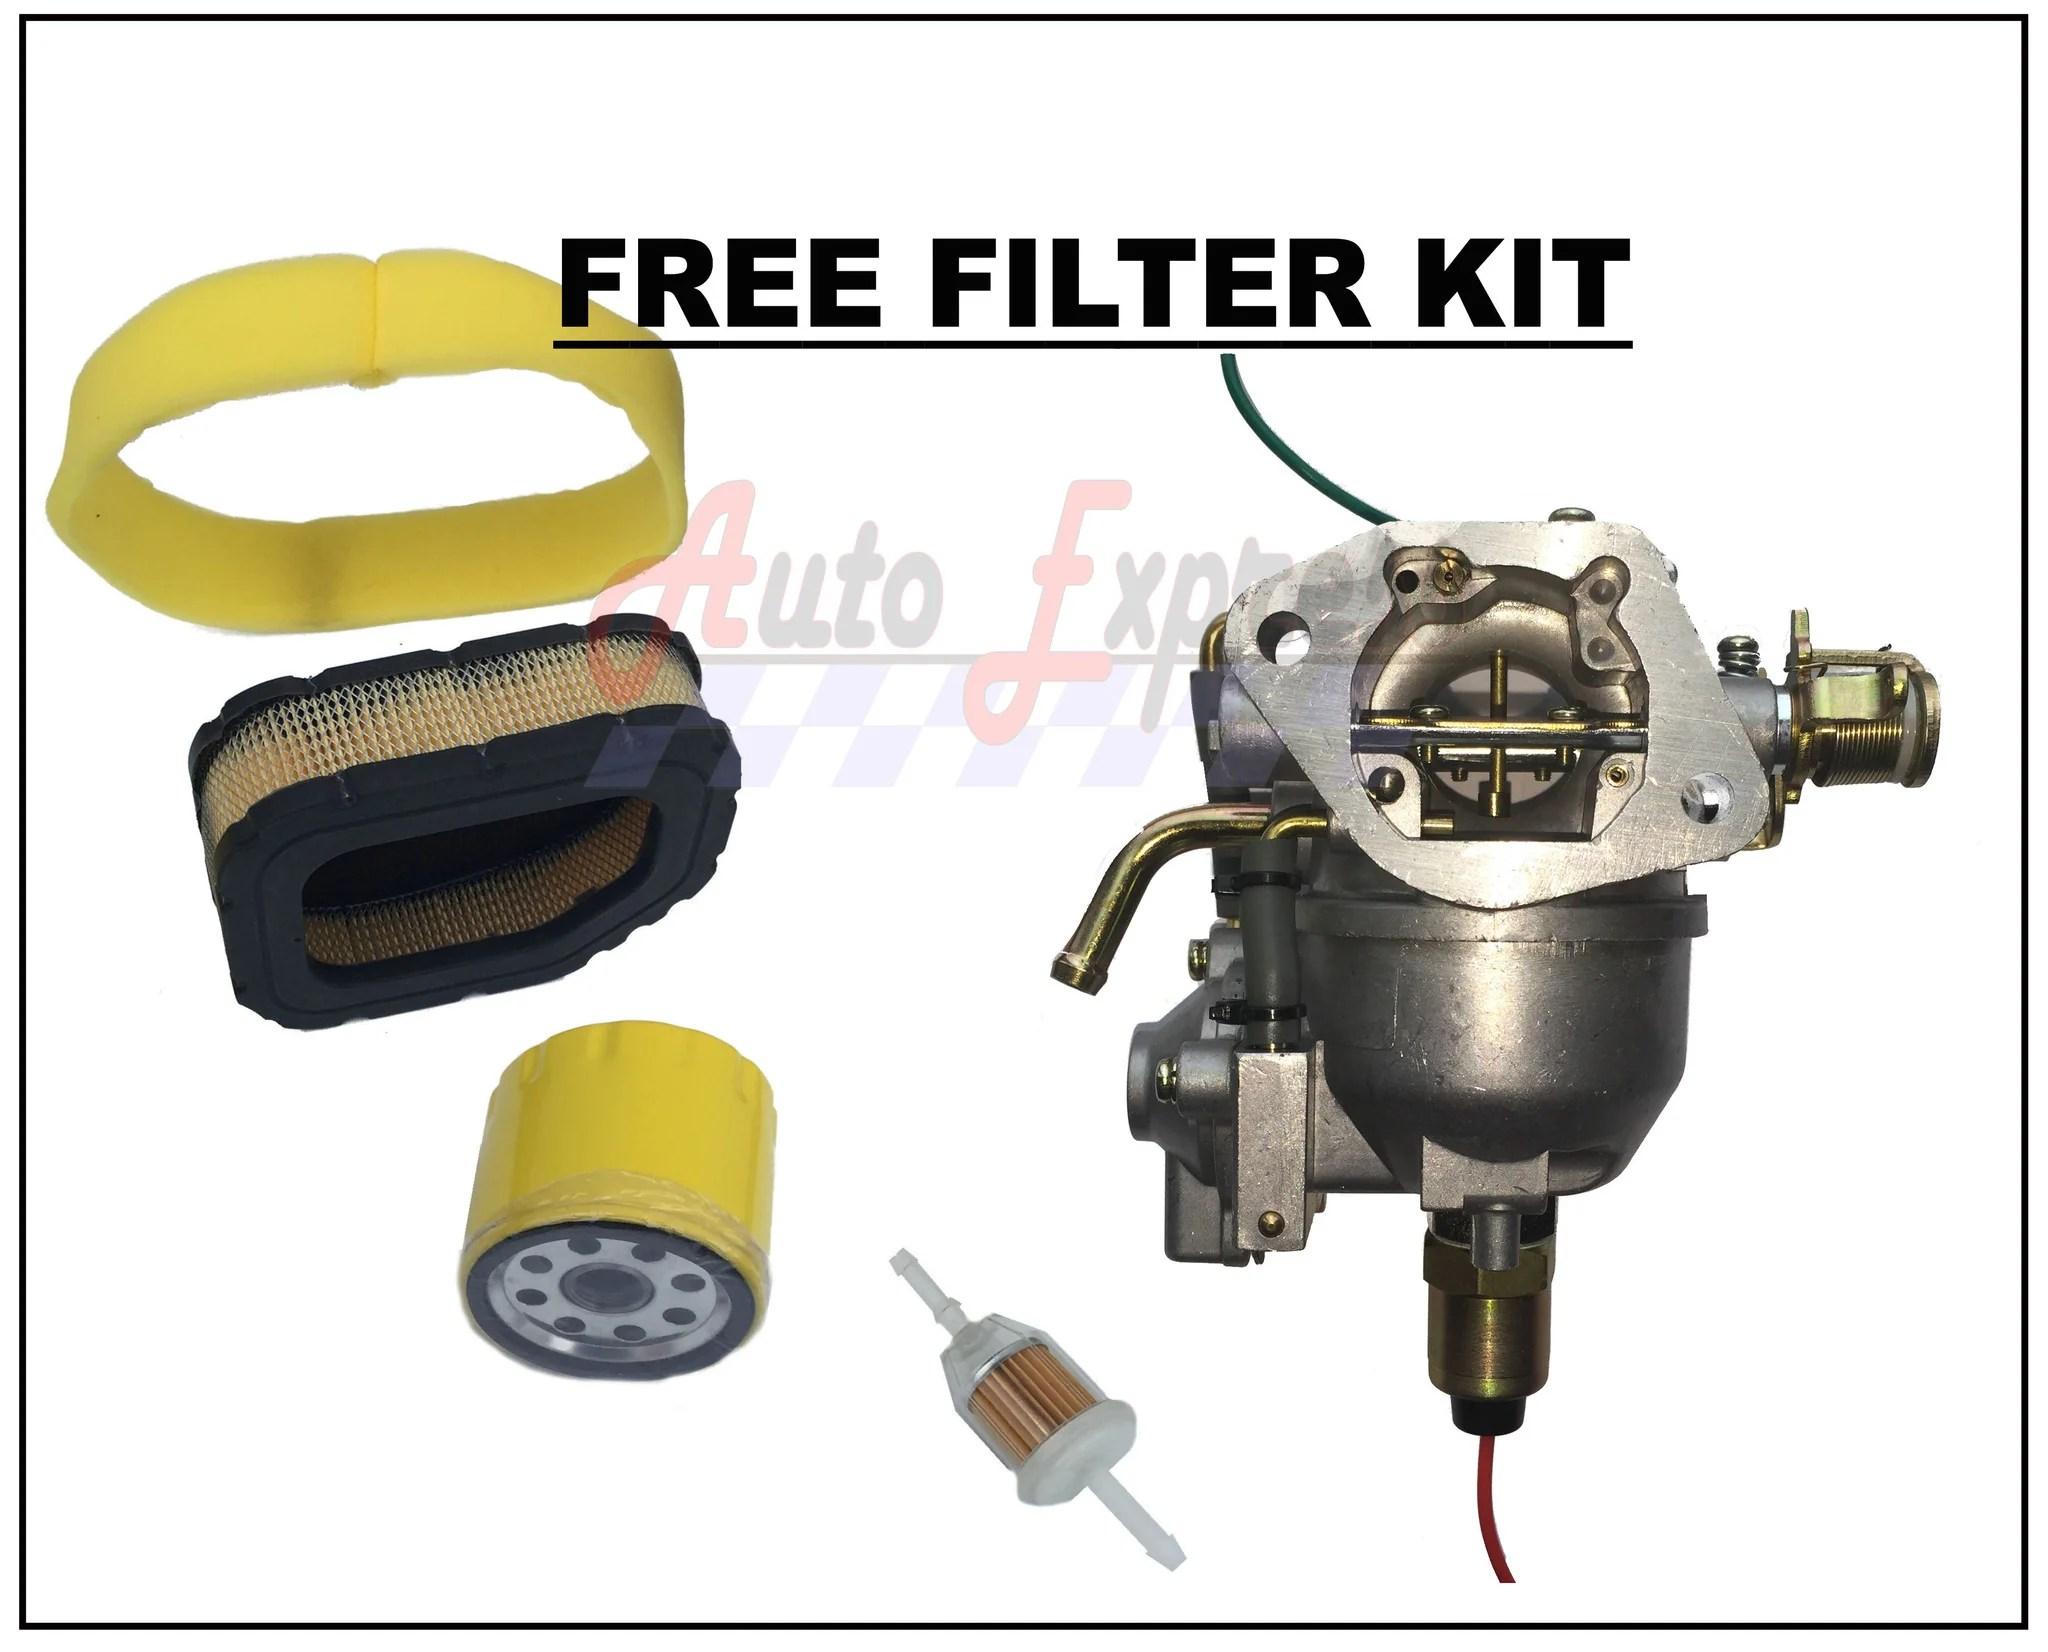 medium resolution of nikki carburetor fits kohler ch18 ch20 carb pump air oil fuel filters